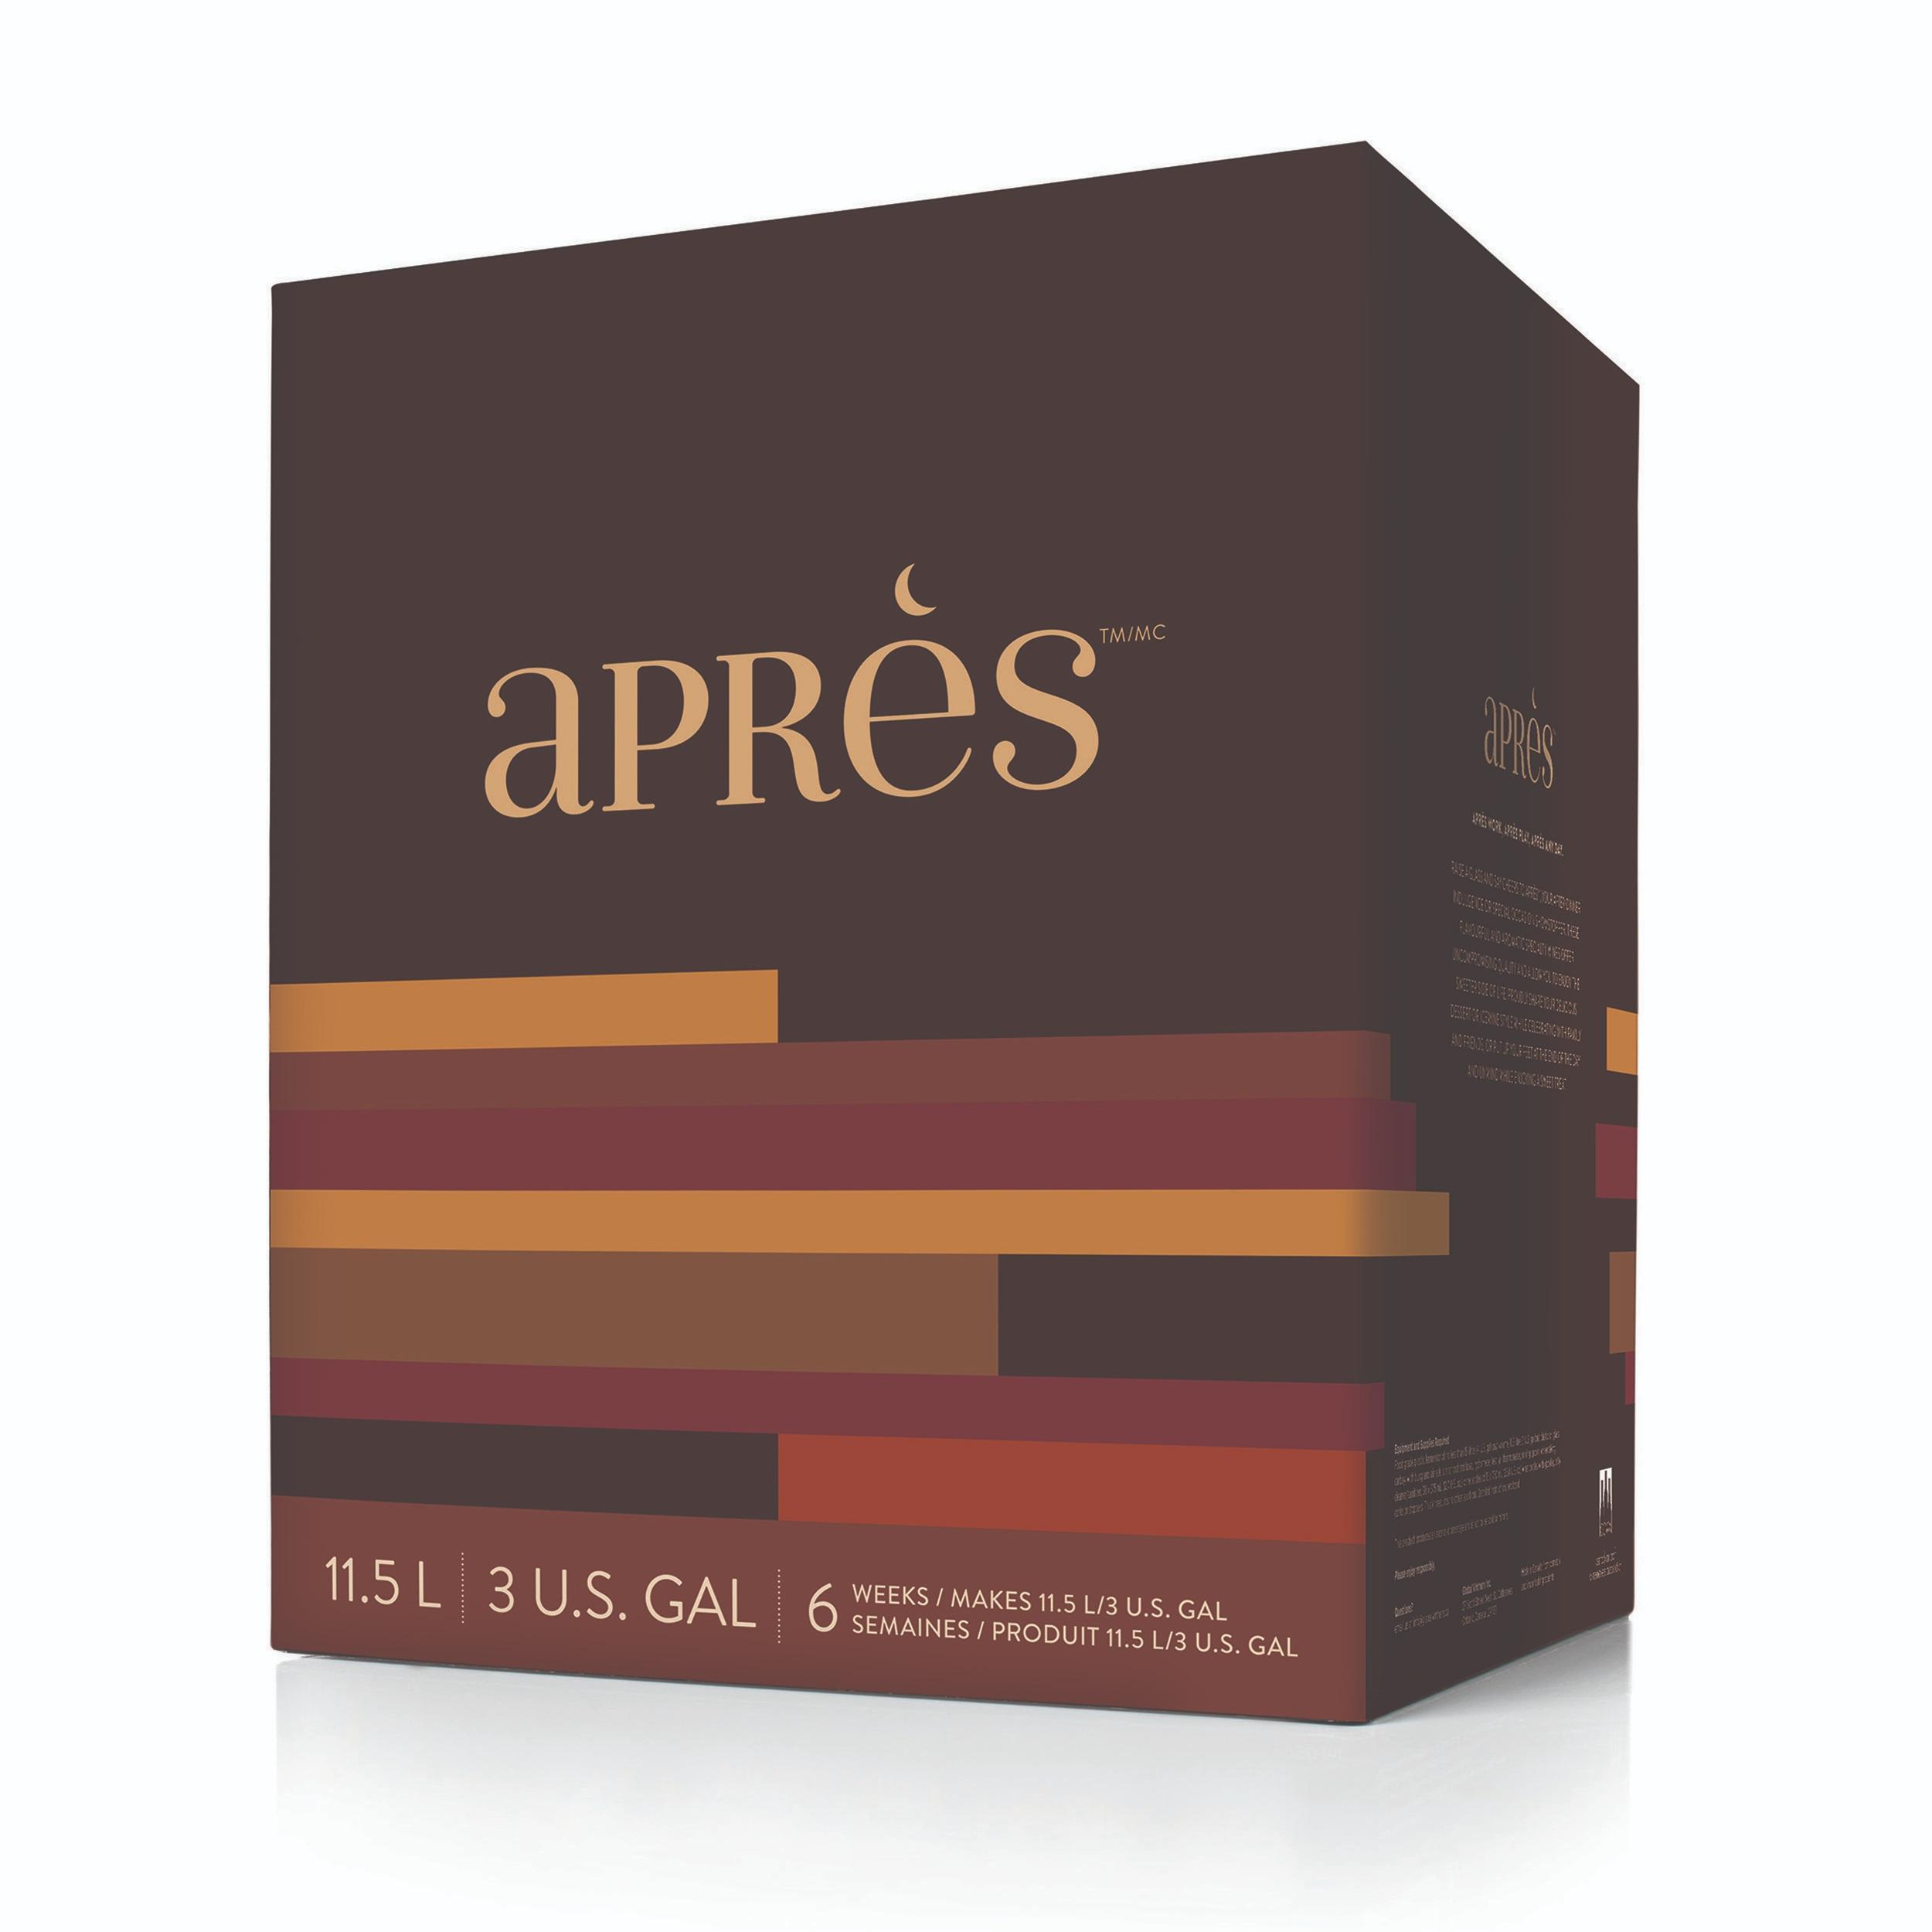 Apres-box-3d-HD-1.jpg